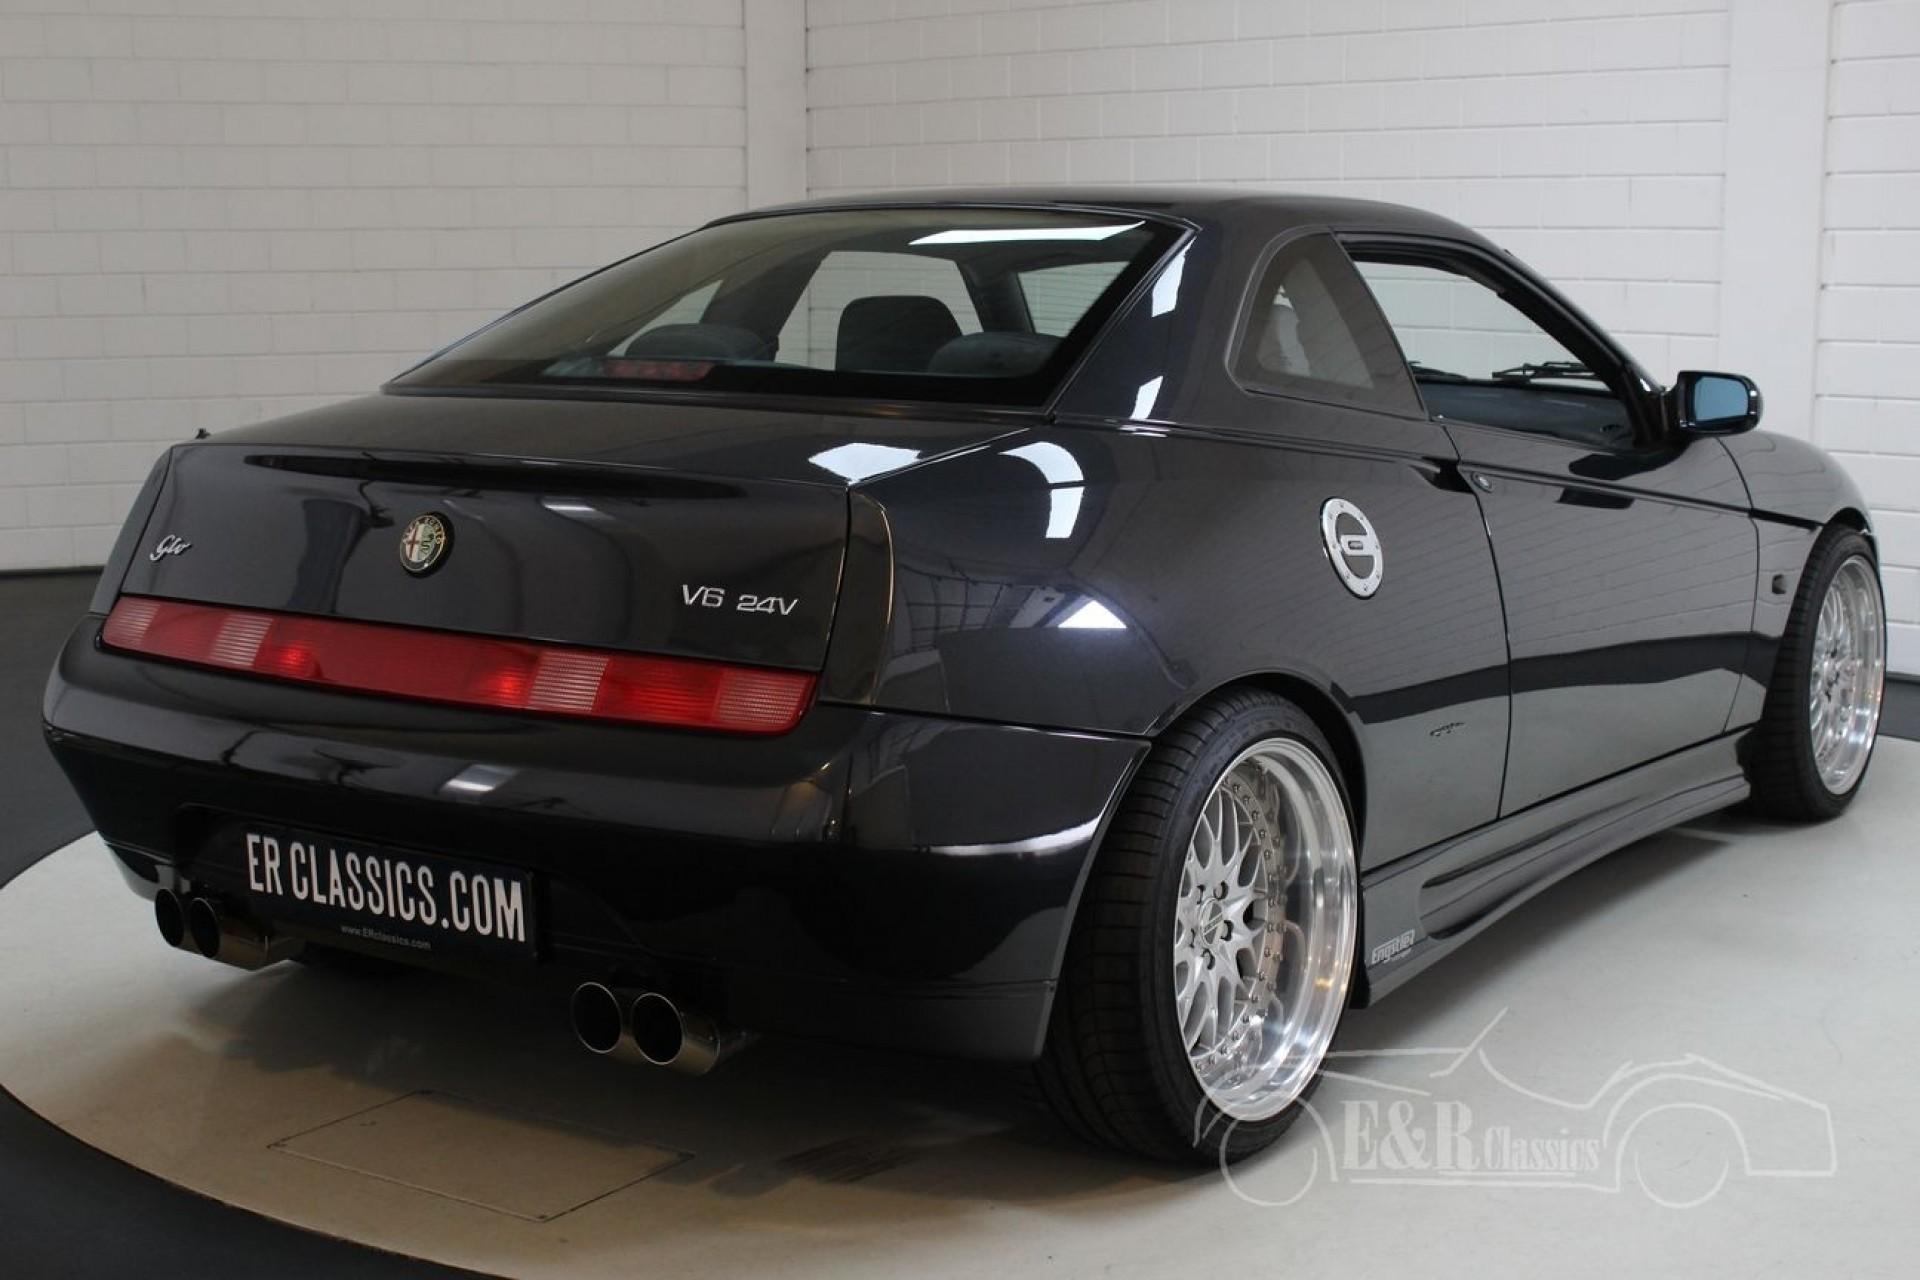 Alfa Romeo Gtv 3 0 V6 Coupe 1997 For Sale At Erclassics